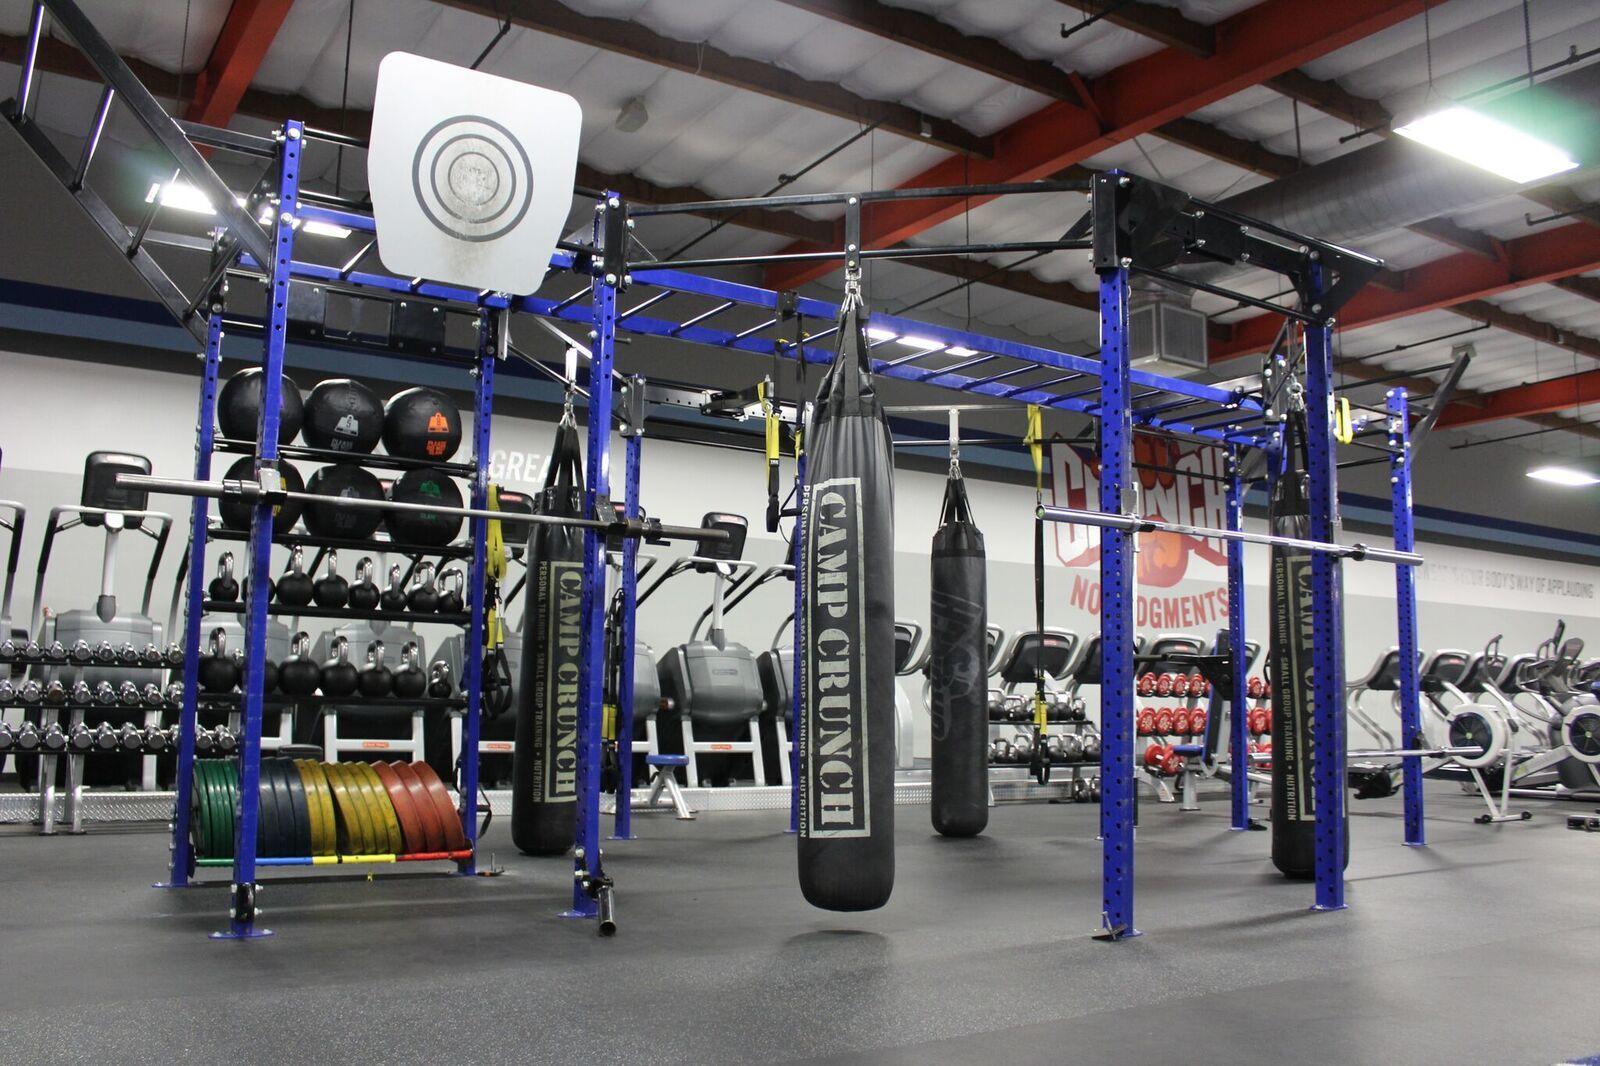 DivaFit by Squeem 62WT Sports Waist Cincher Gym Girdle Workout Exercise Diva Fit